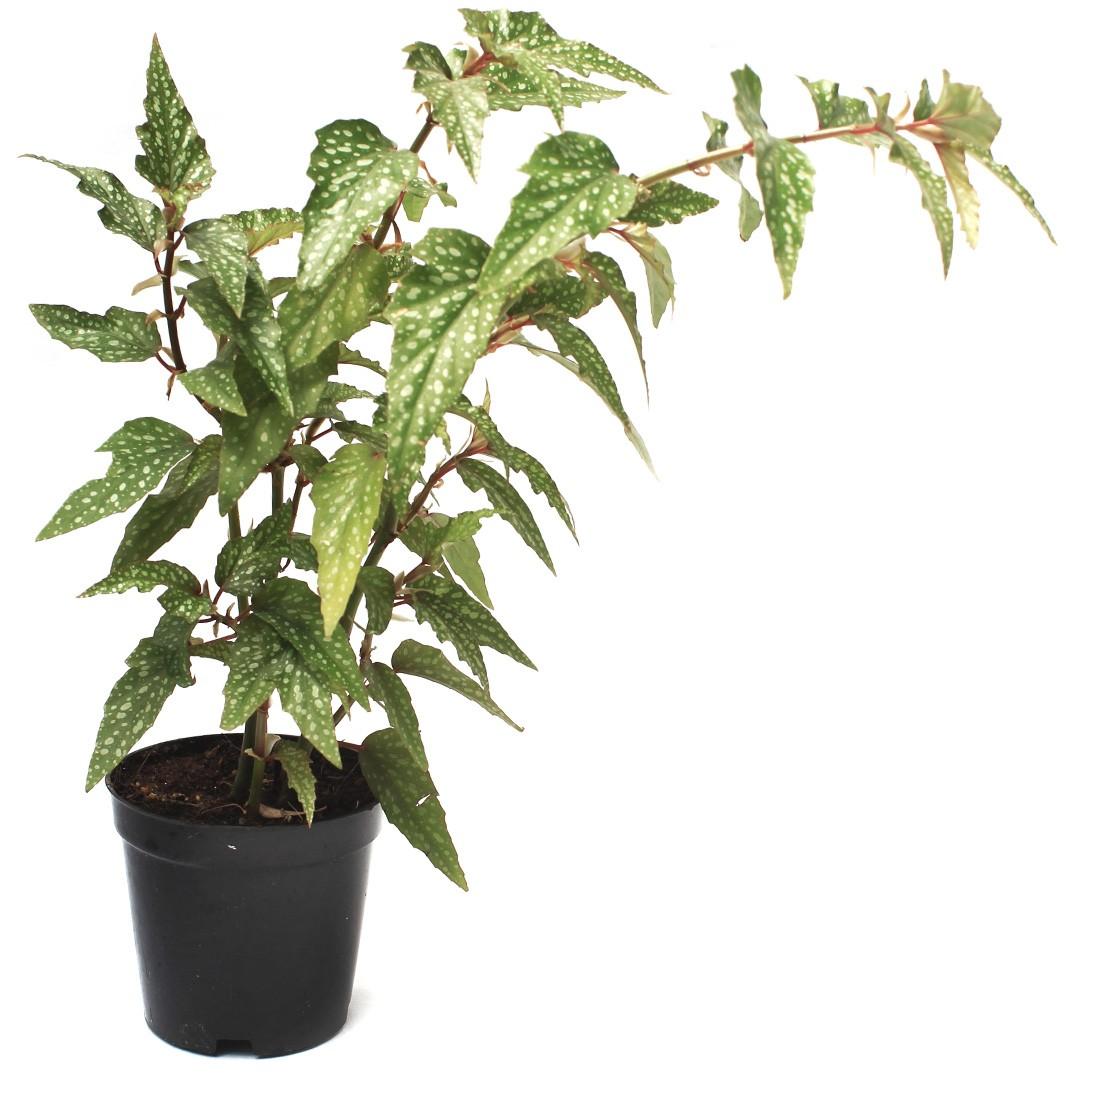 begonia maculata tamaya in live plant nursery